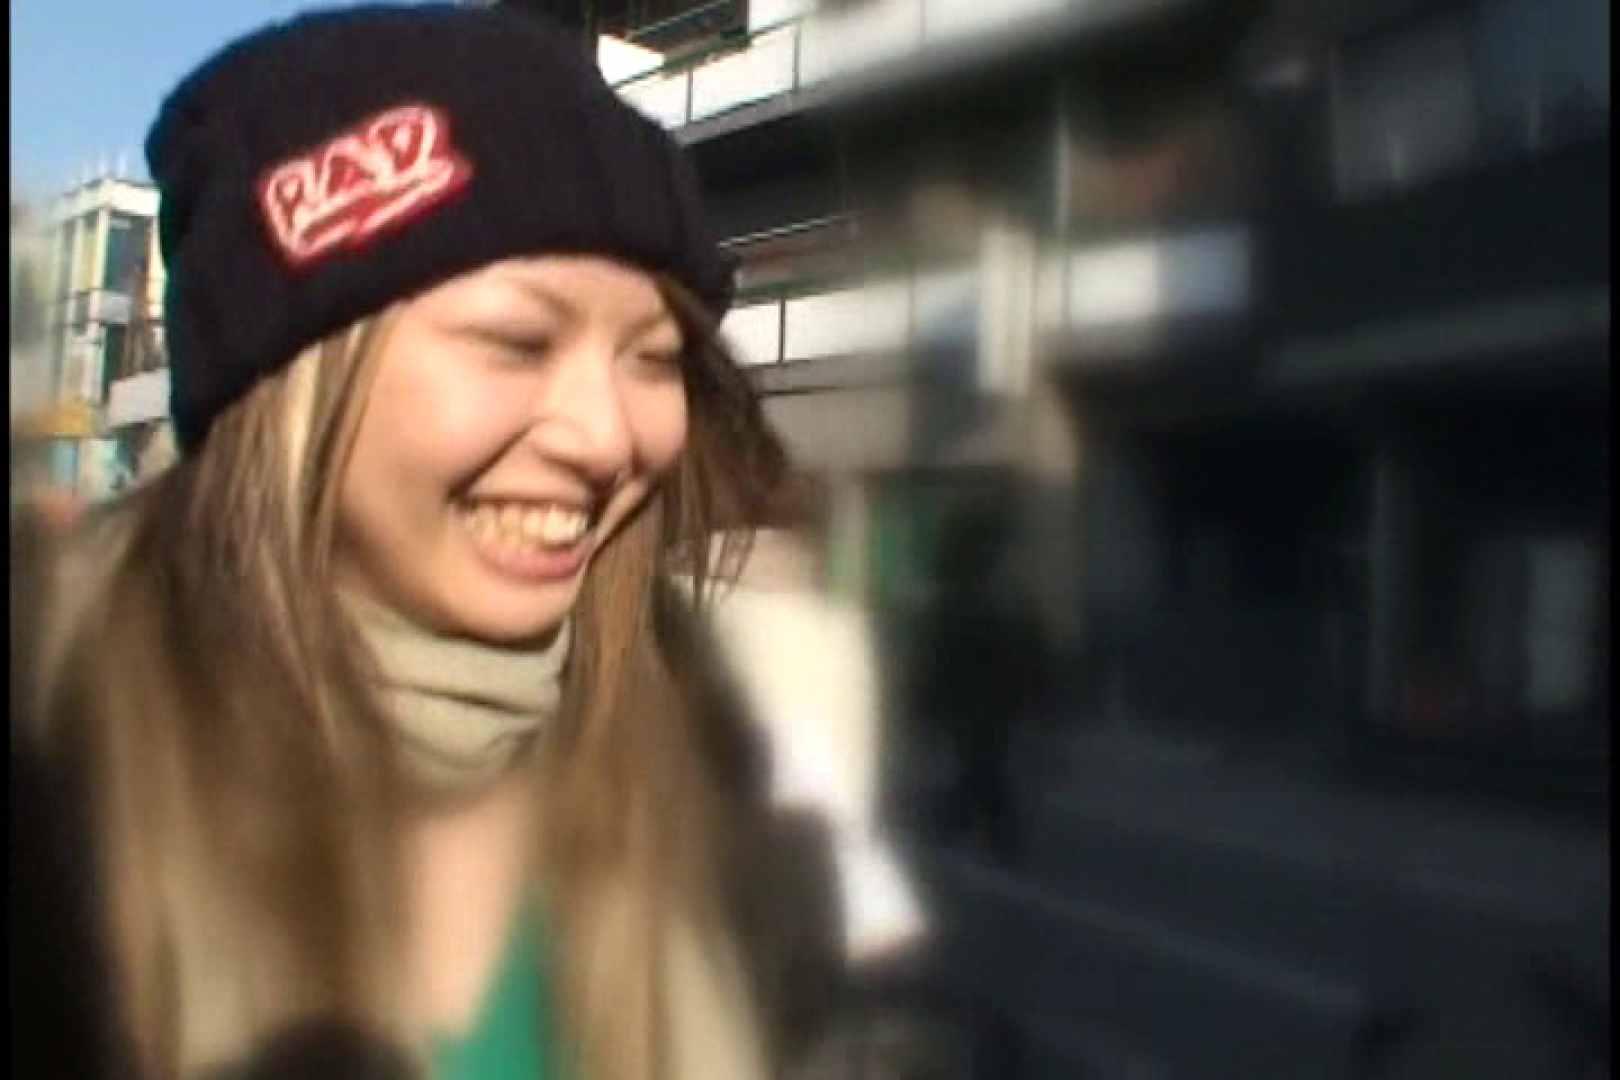 JDハンター全国ツアー vol.012 前編 女子大生のエロ動画  91PIX 28